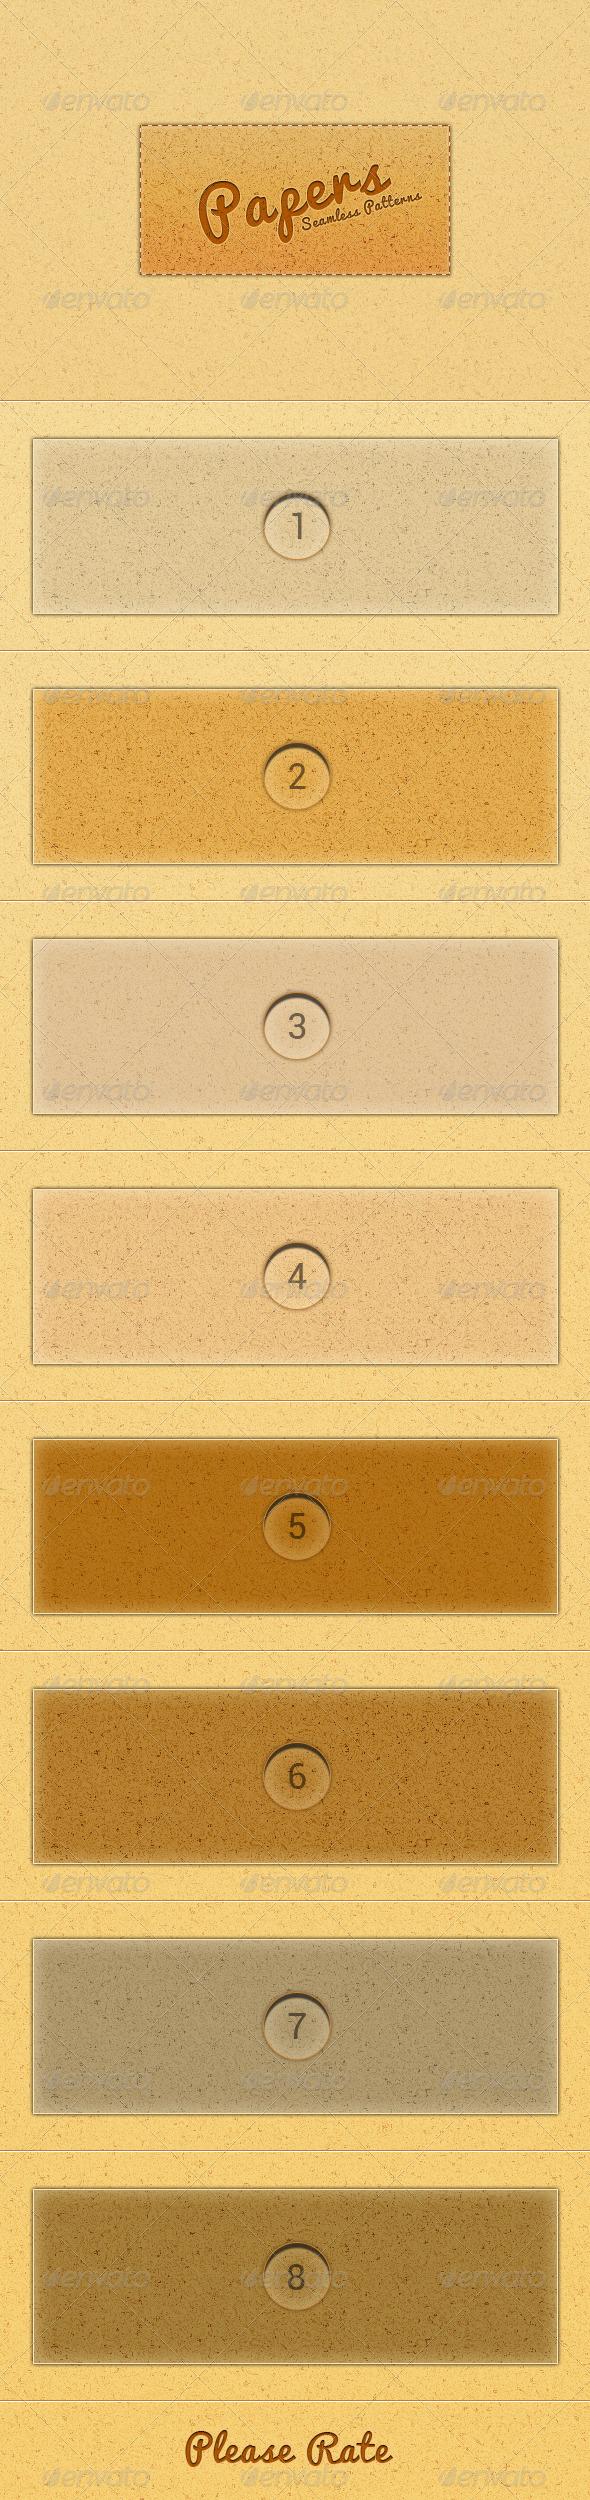 Eight Seamless Paper Texture Patterns - Textures / Fills / Patterns Photoshop